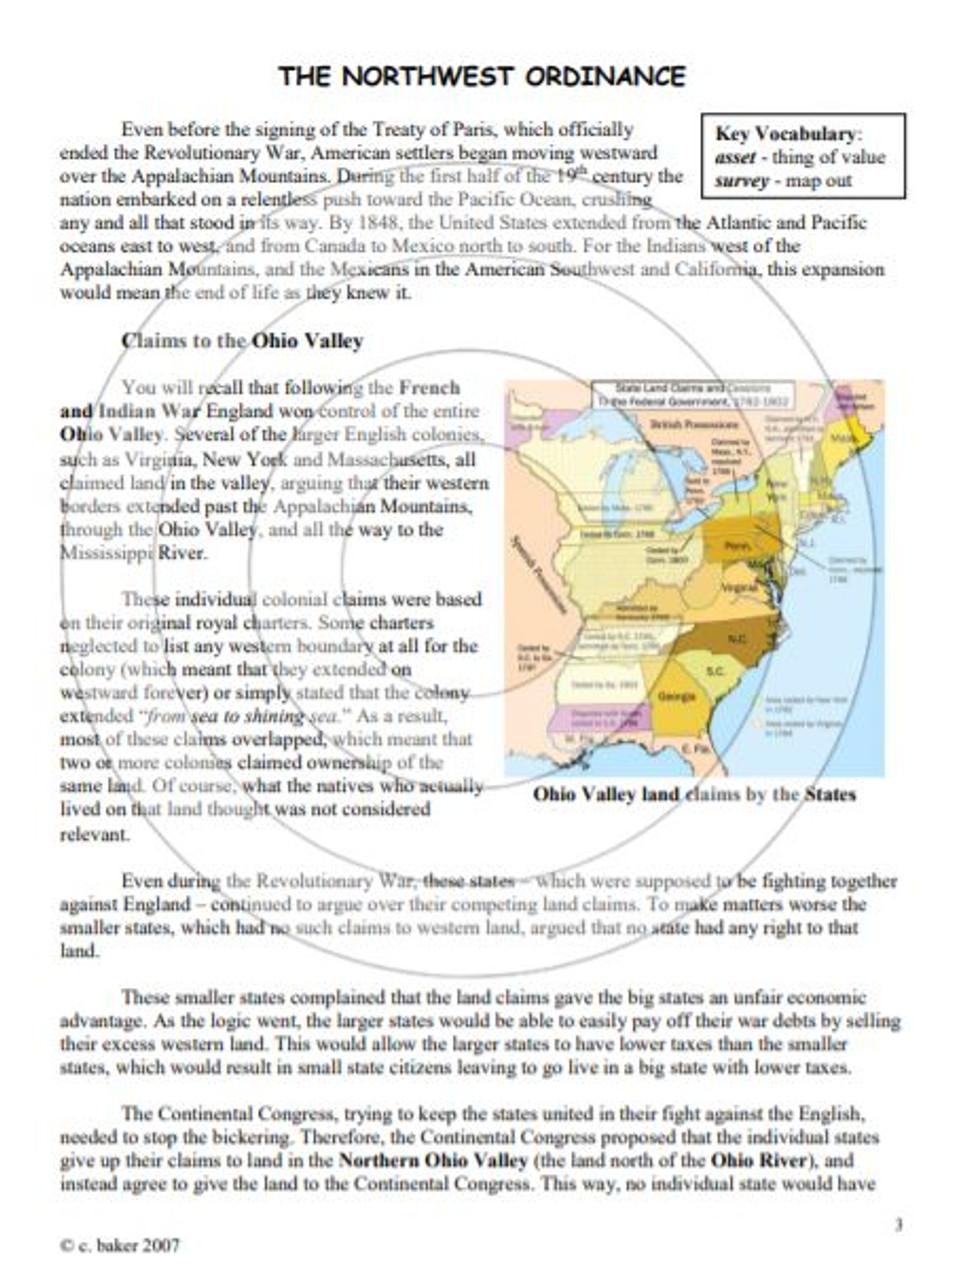 Westward Ho! - Expansion of the Continental U.S. unit bundle, including text